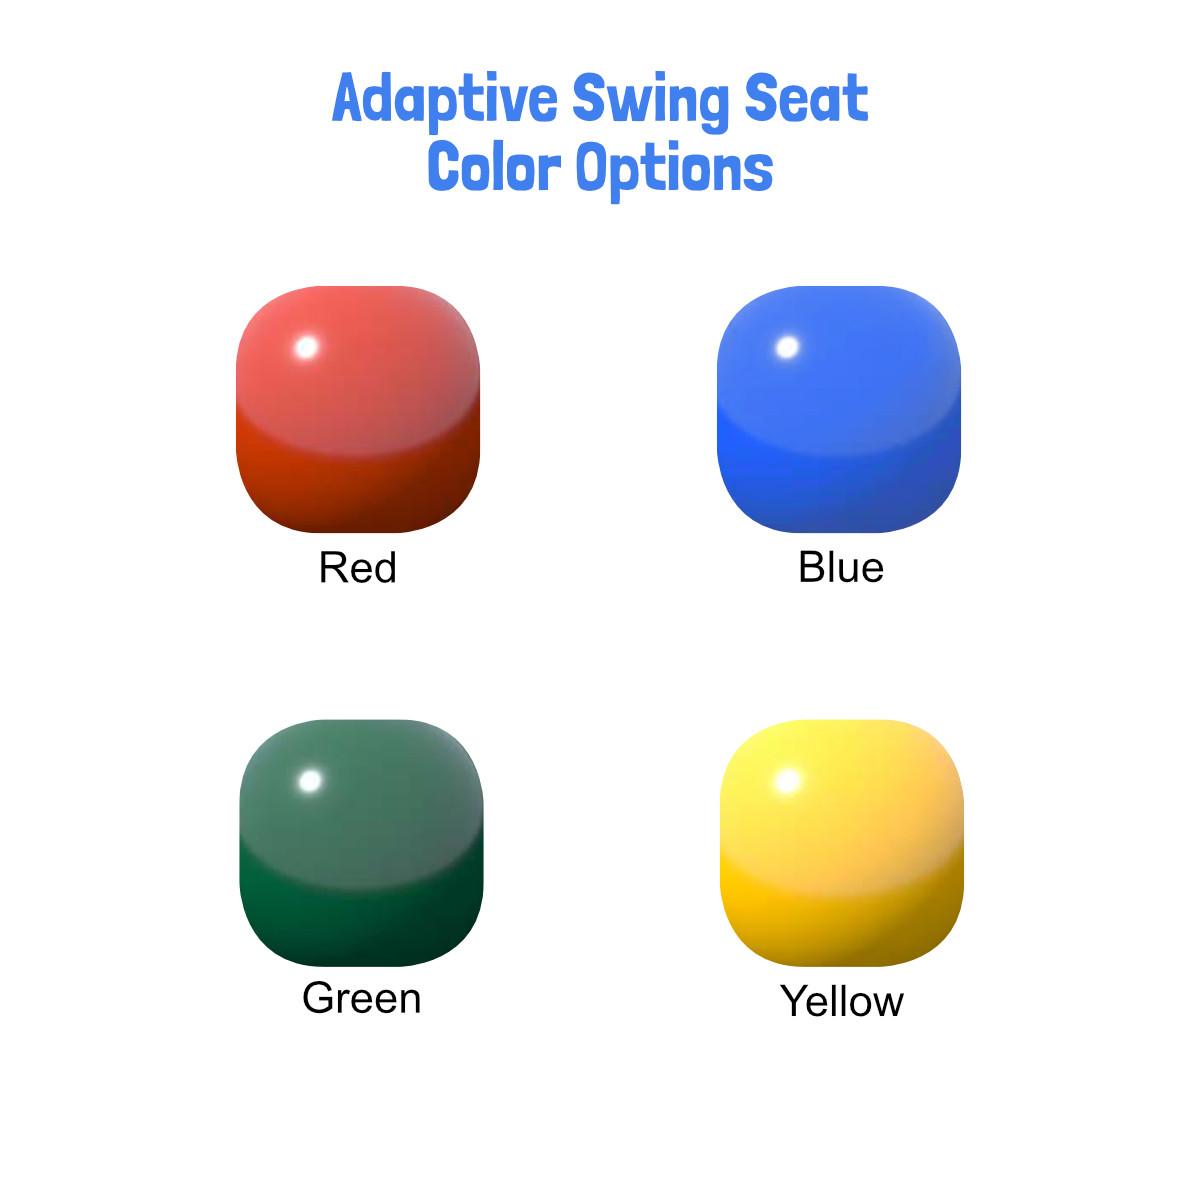 Adaptive Swing Seat (ADP-10) - Color Options